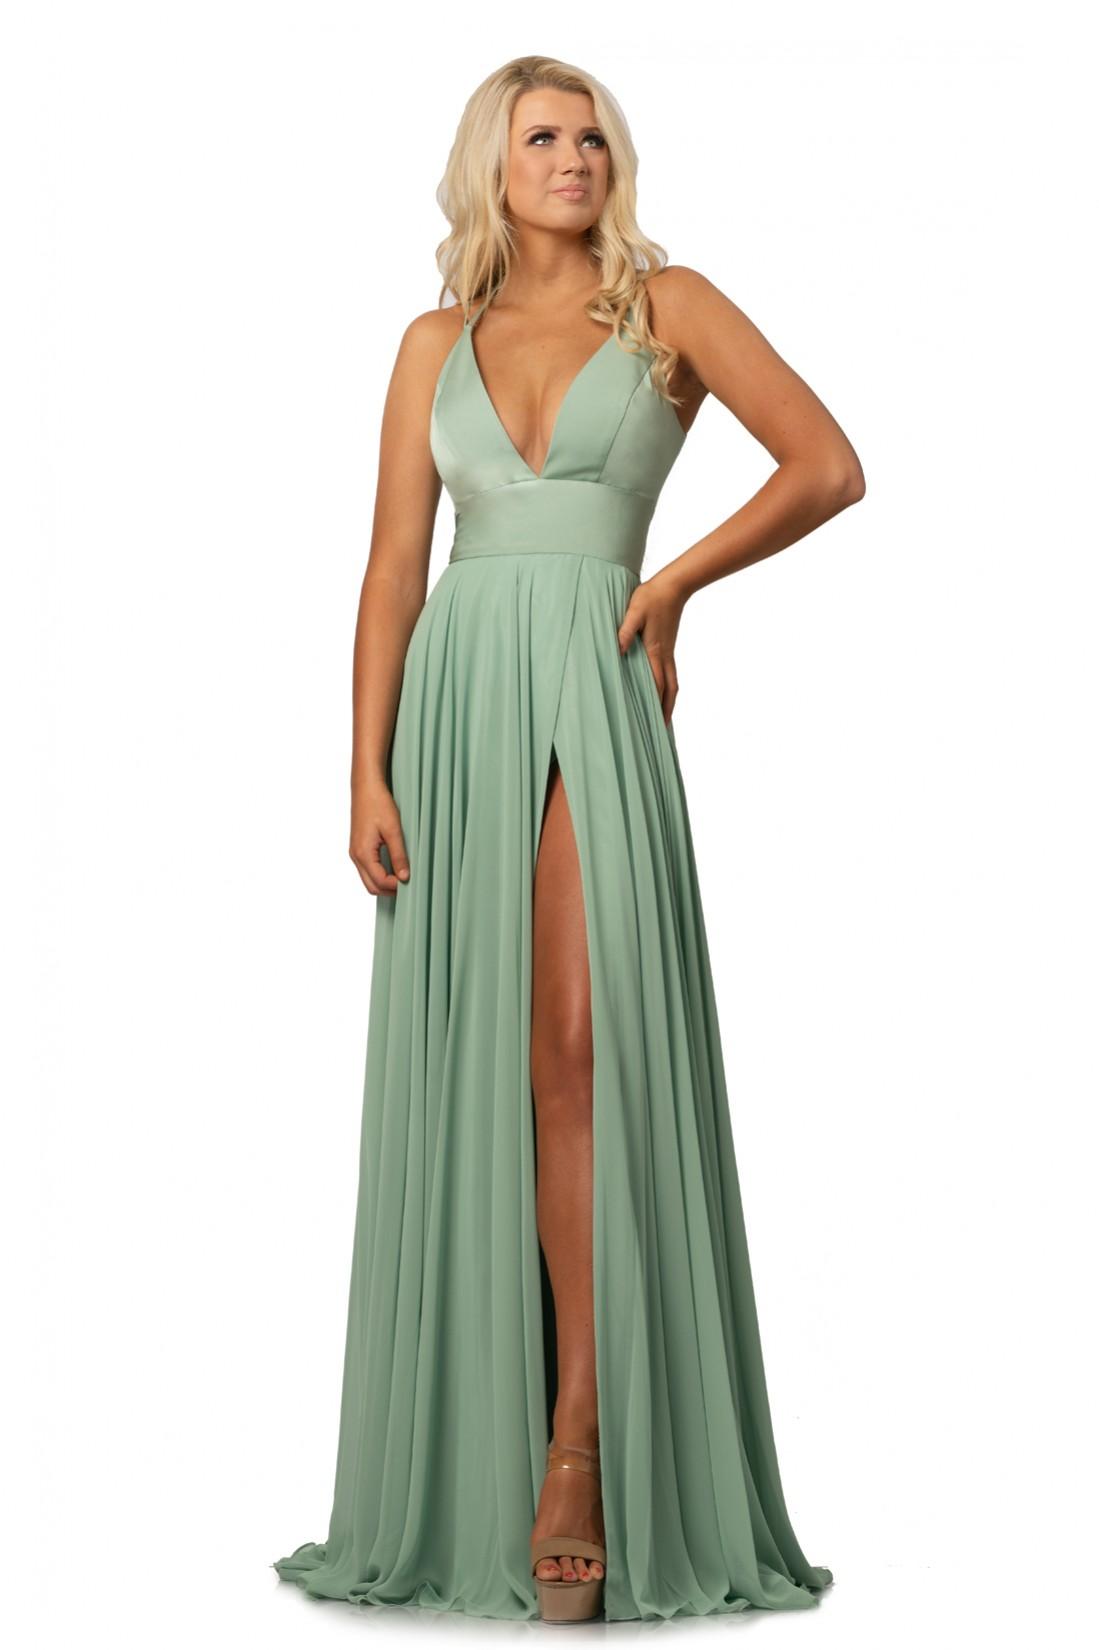 Johnathan Kayne Sage Green Deep V Dress